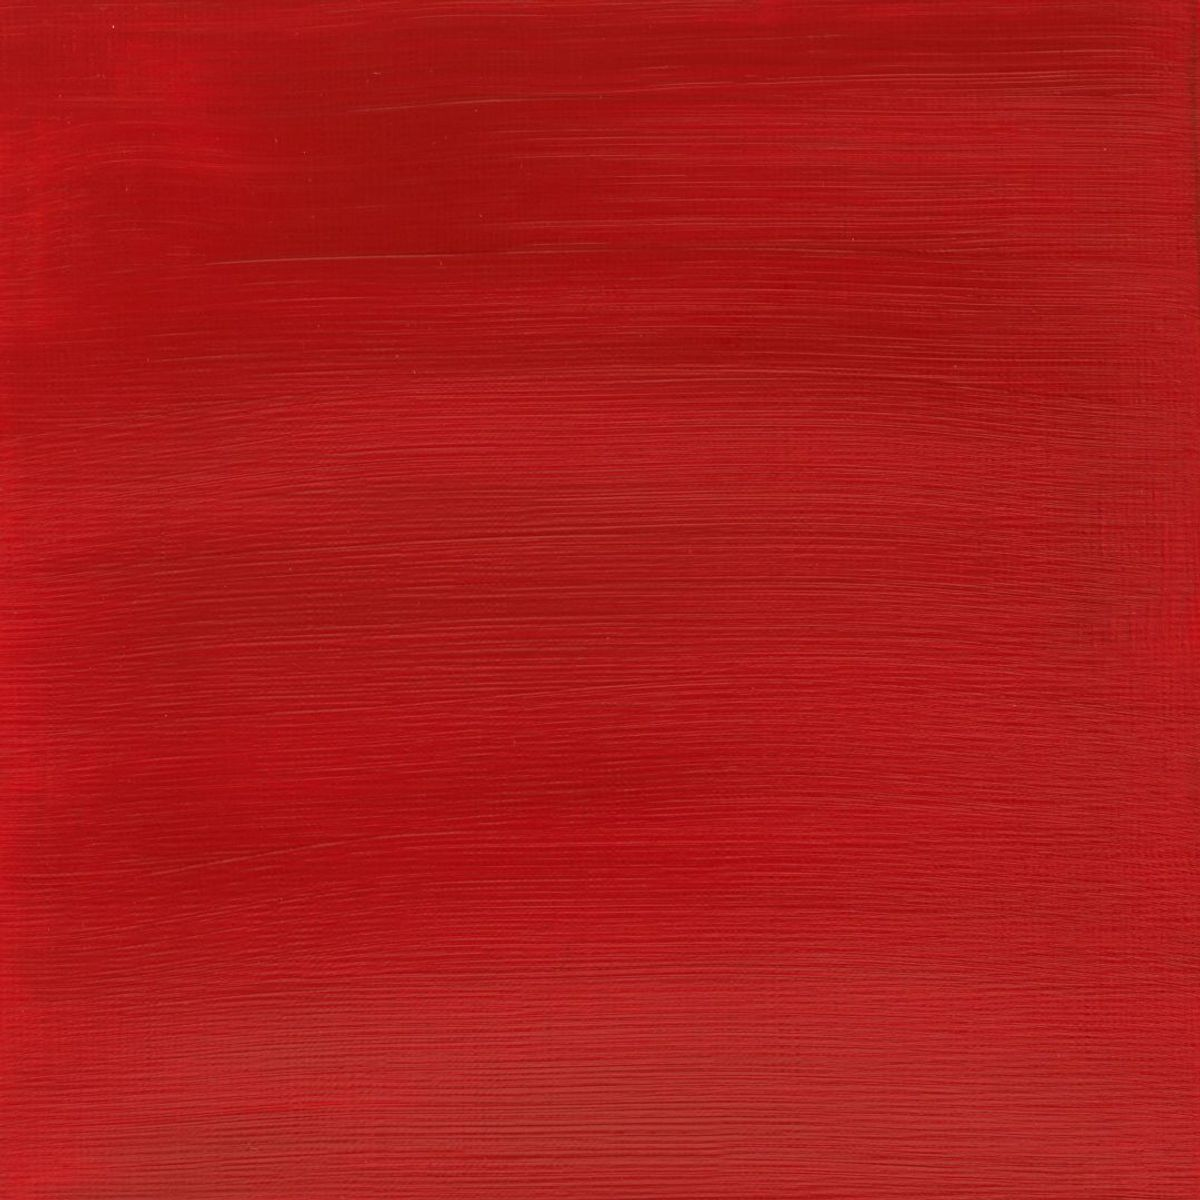 WINSOR AND NEWTON GALERIA ACRYLIC COLOUR - TUBE OF 60 ML - CADMIUM RED HUE (095)